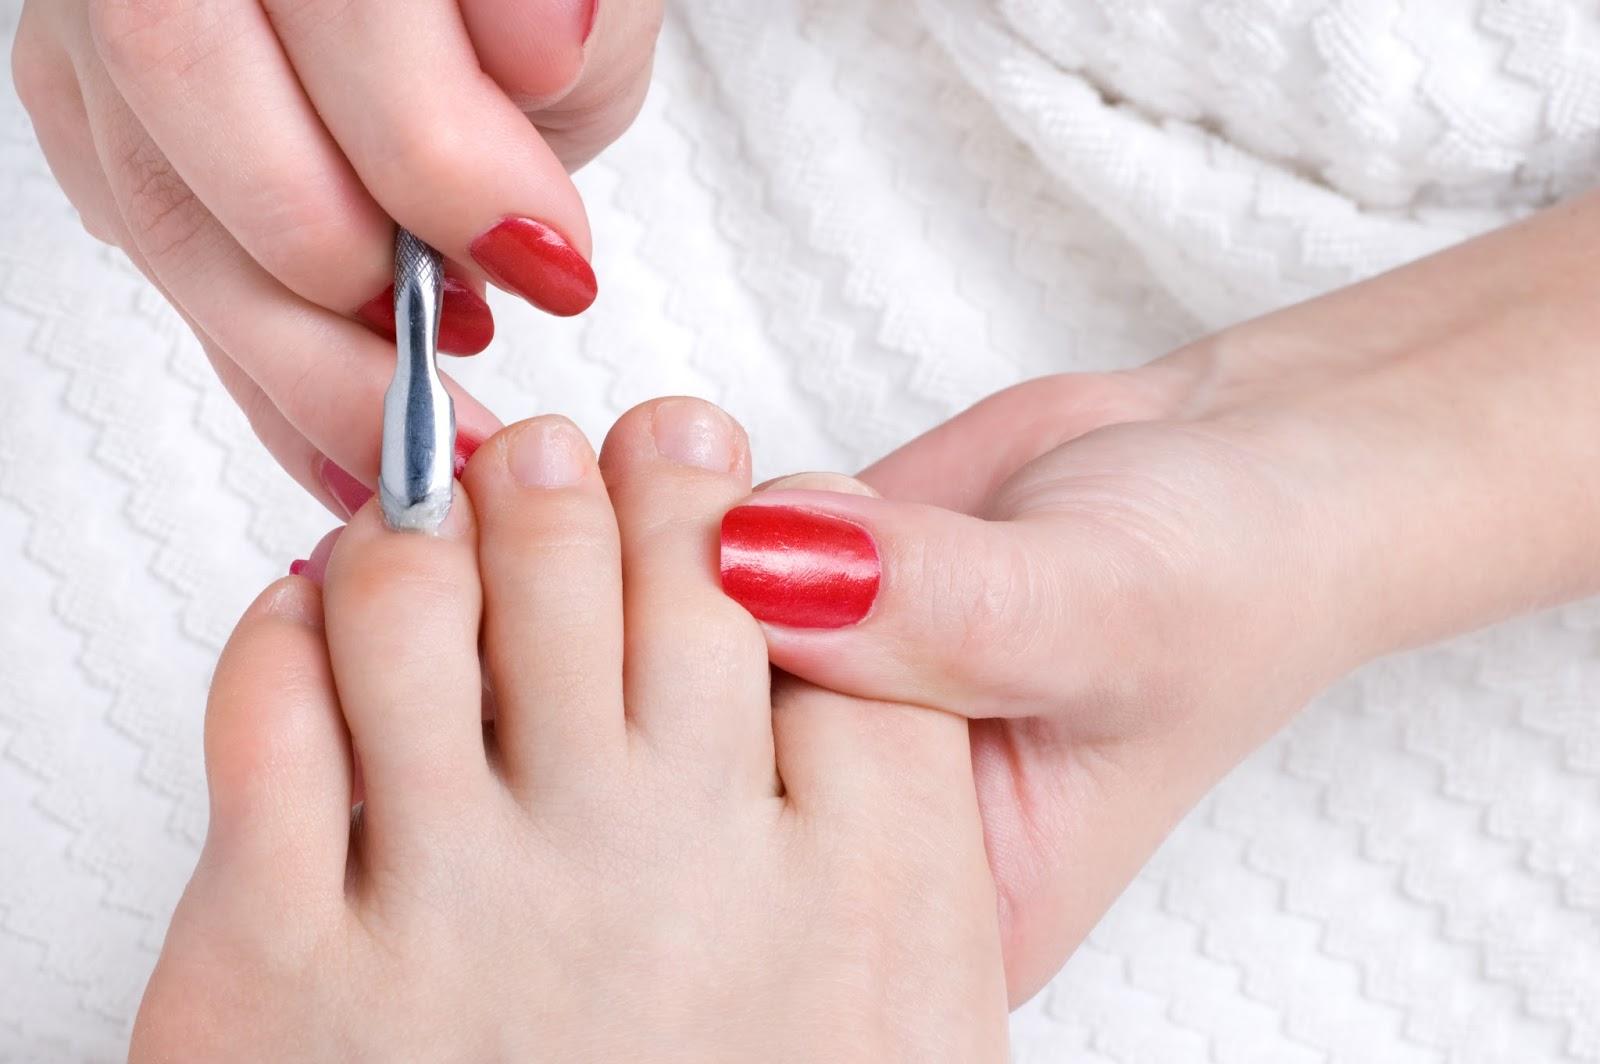 Ruce Nohy A Vse Okolo Pedikura